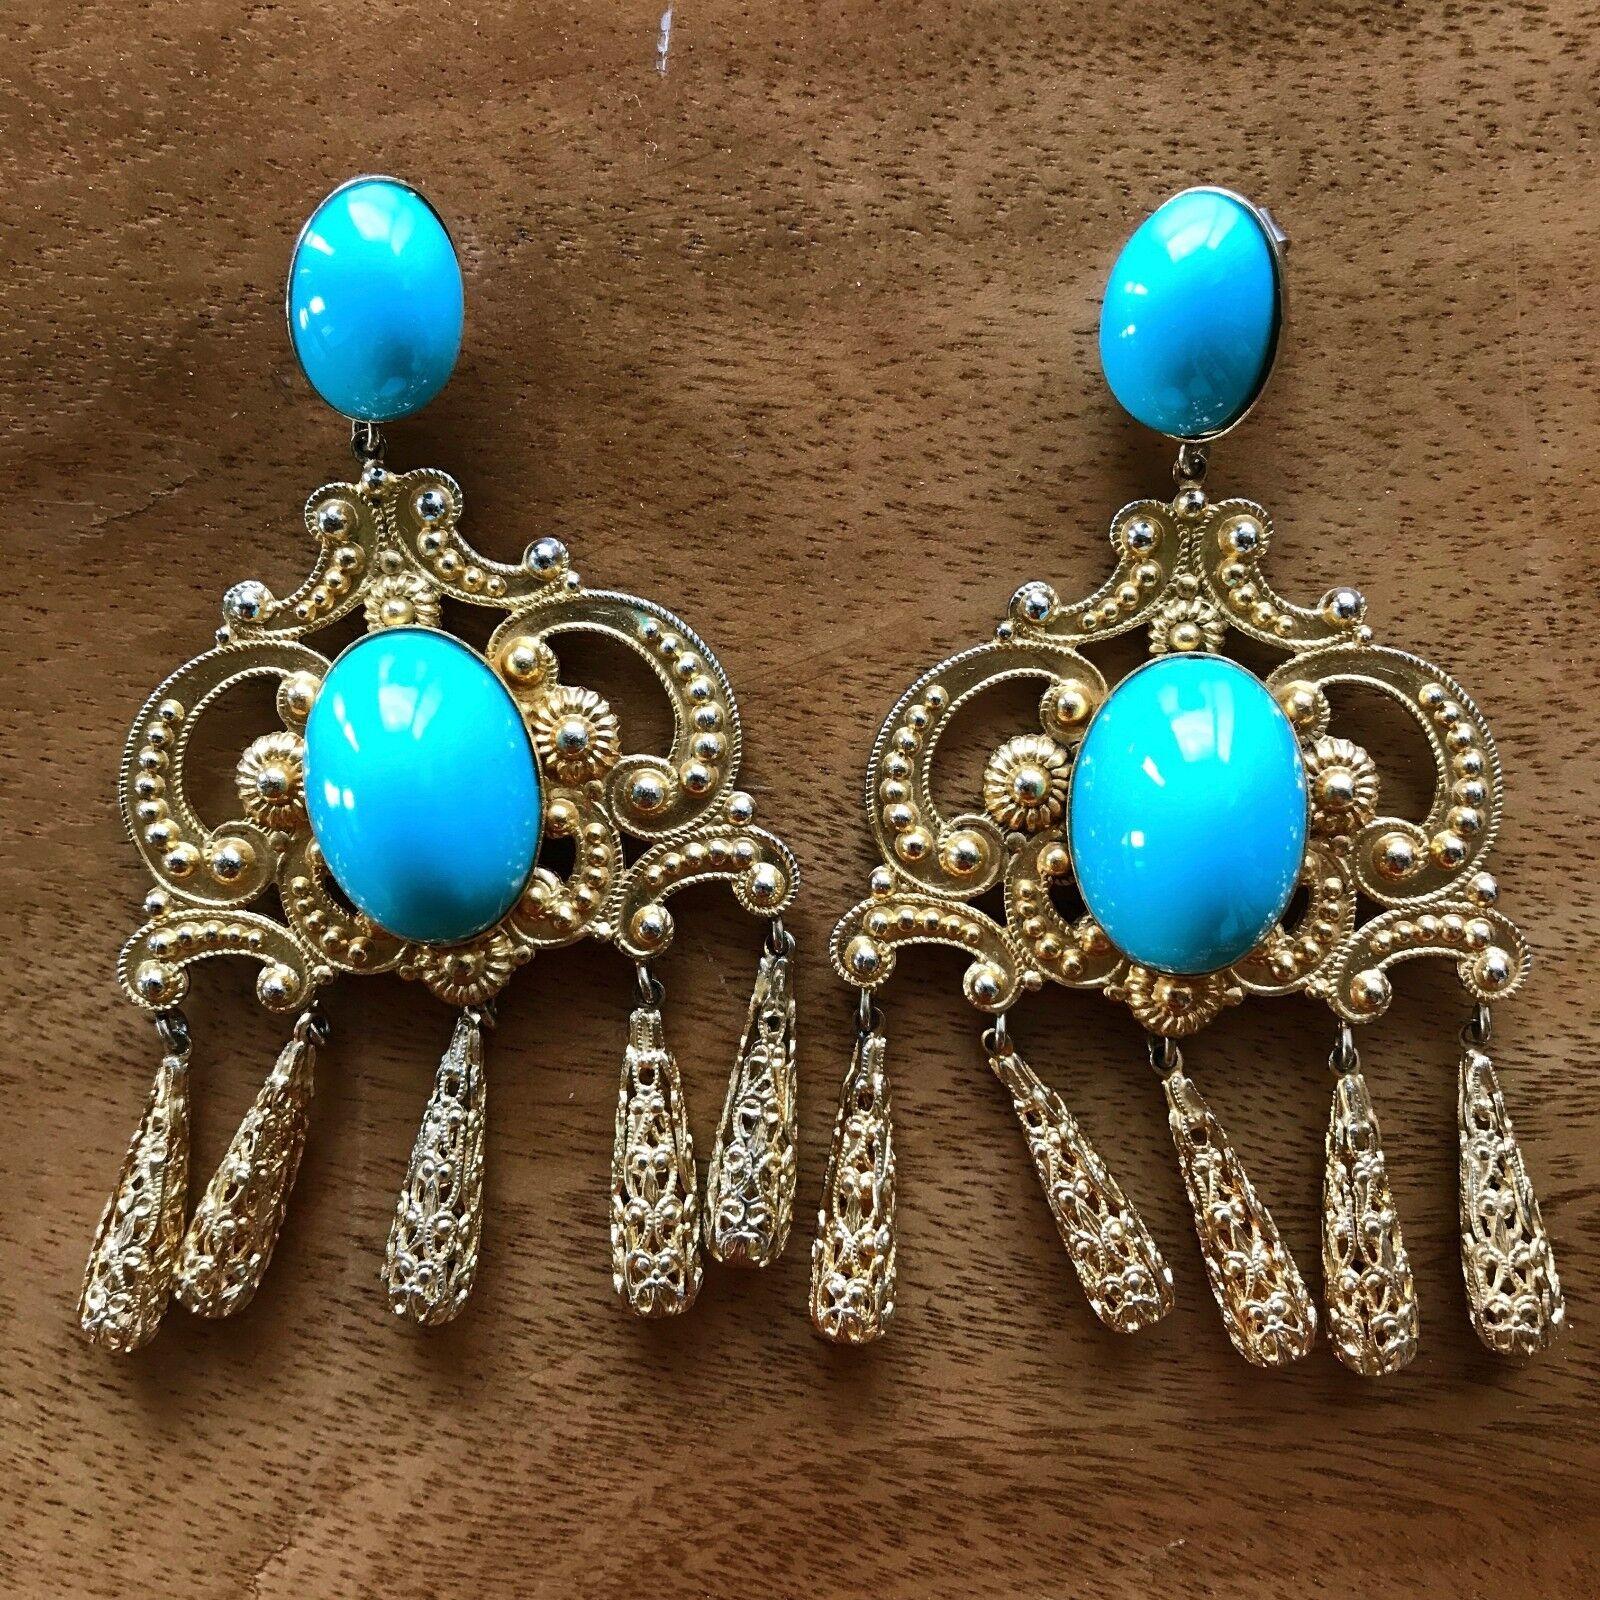 Vintage Woman's Dangle Turquoise Elegant Beautiful Earrings